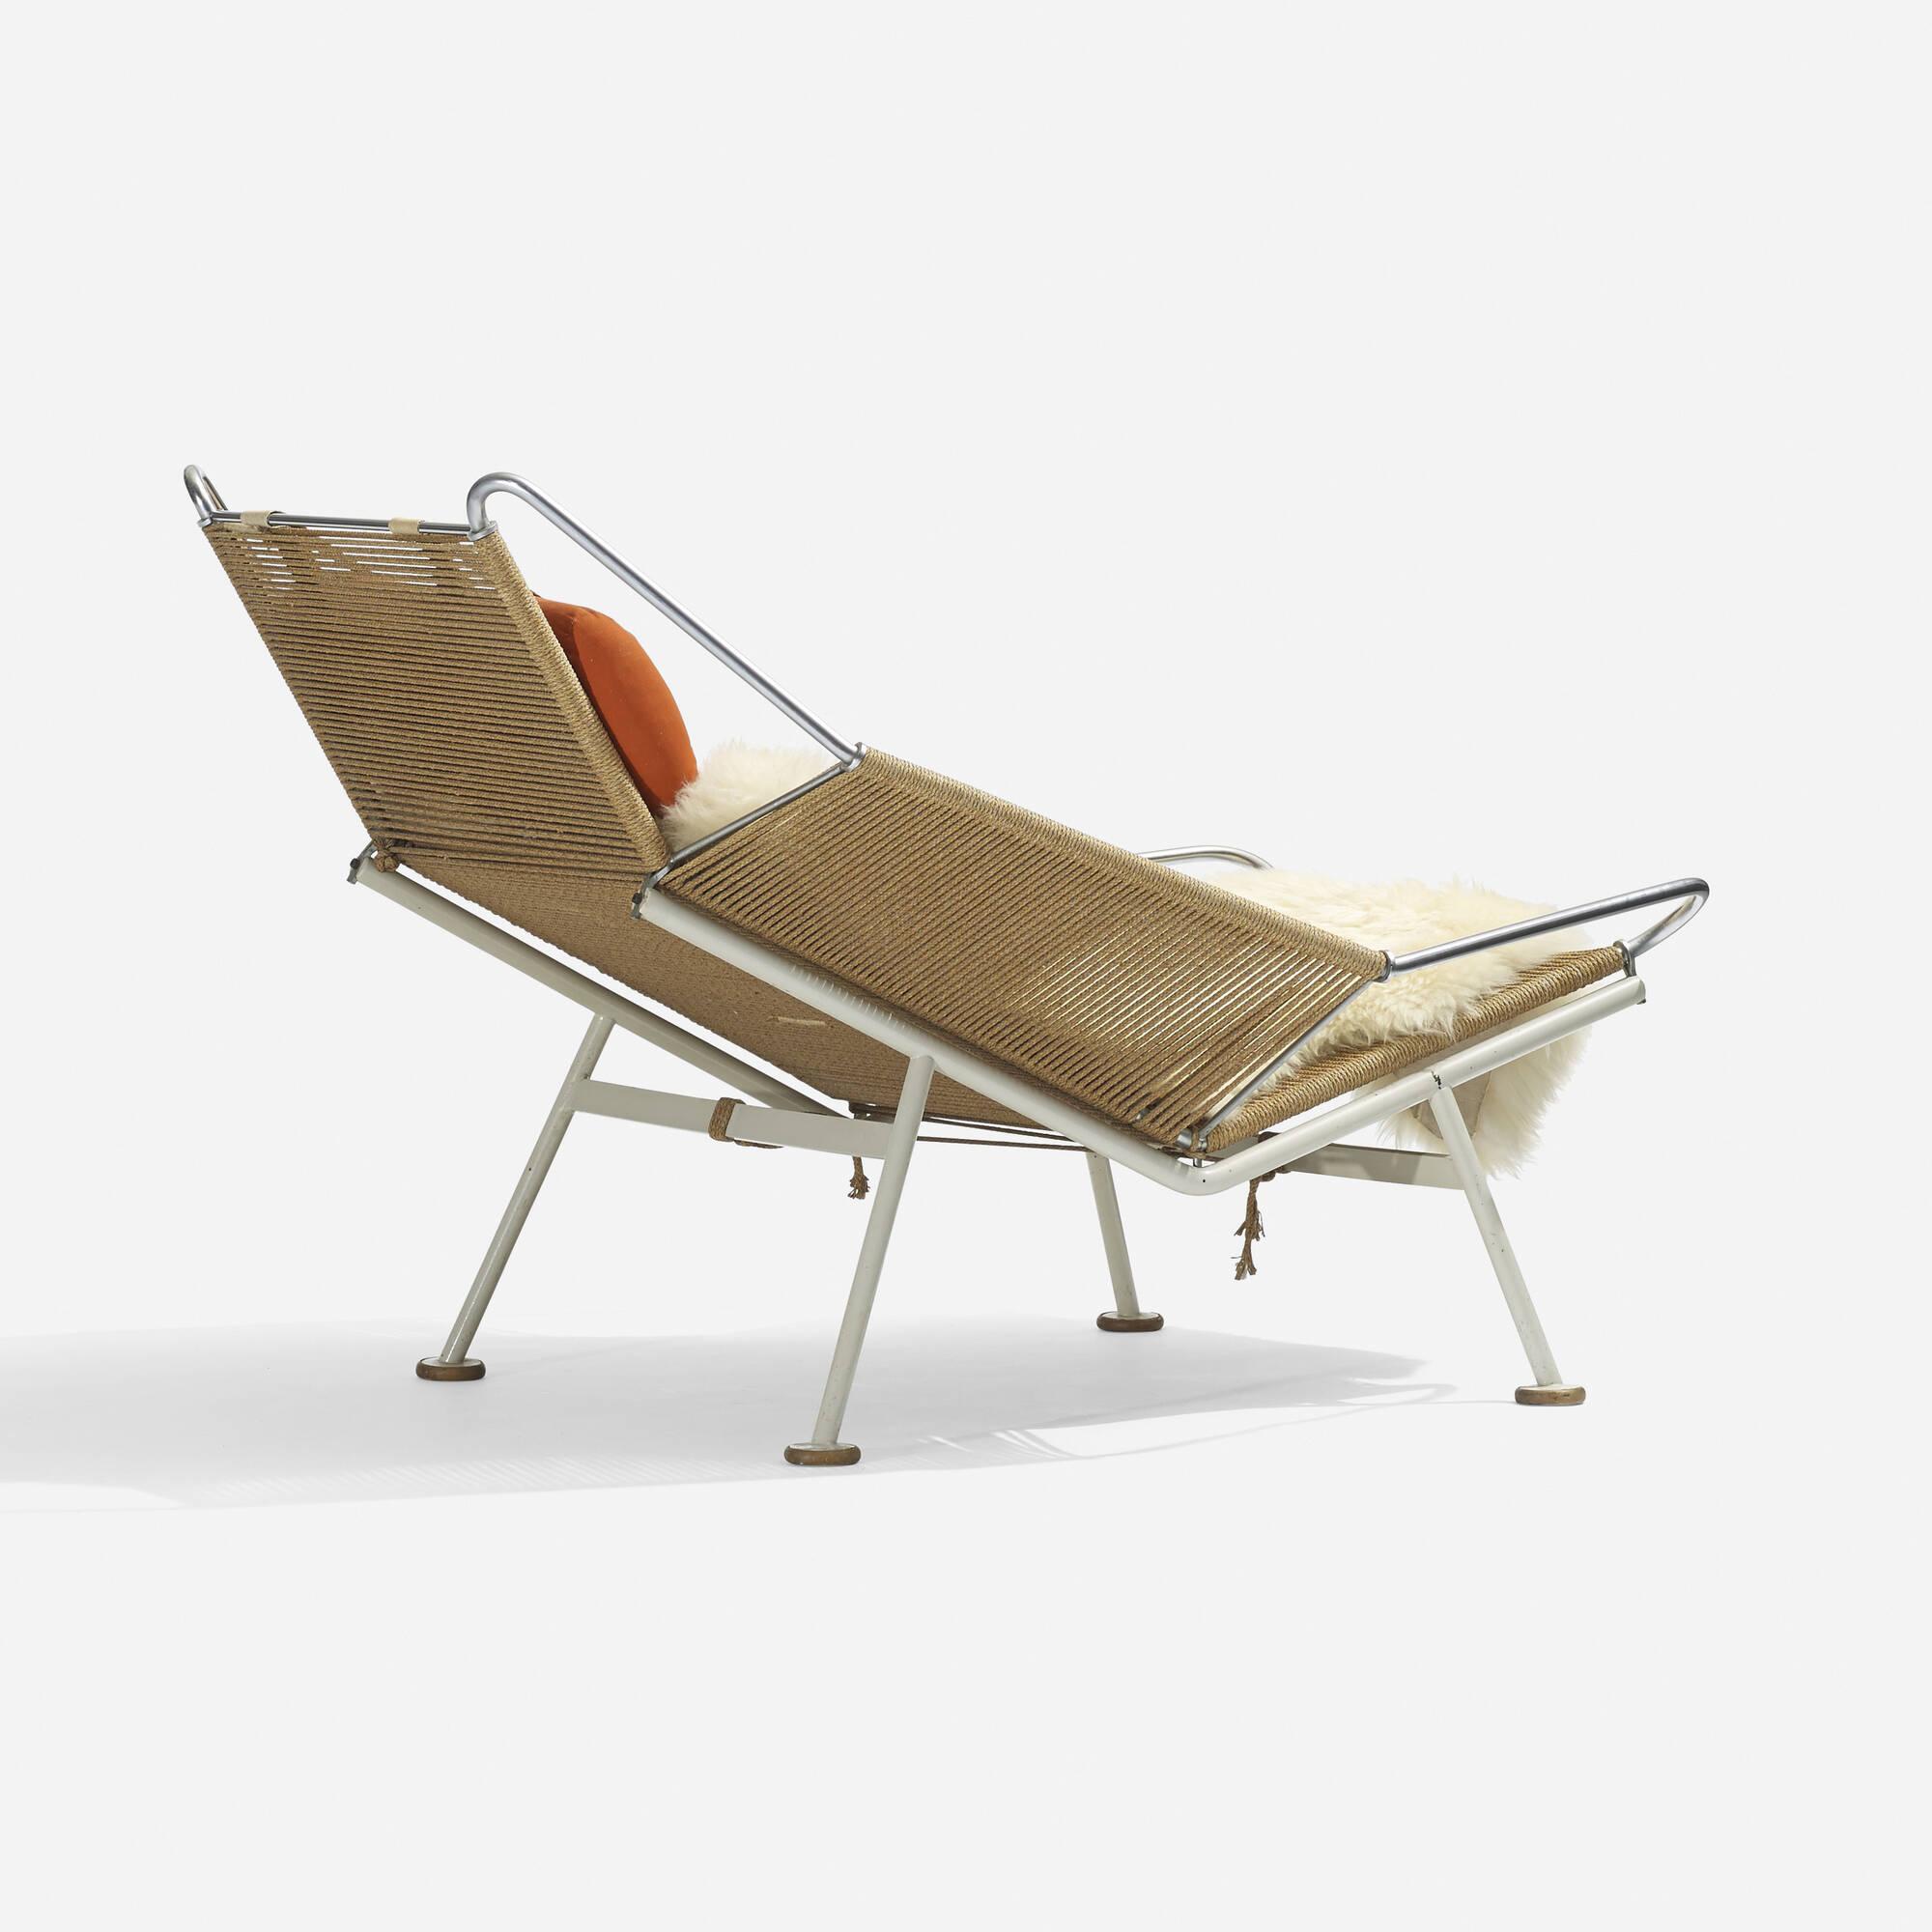 182 Hans J Wegner Flag Halyard lounge chair